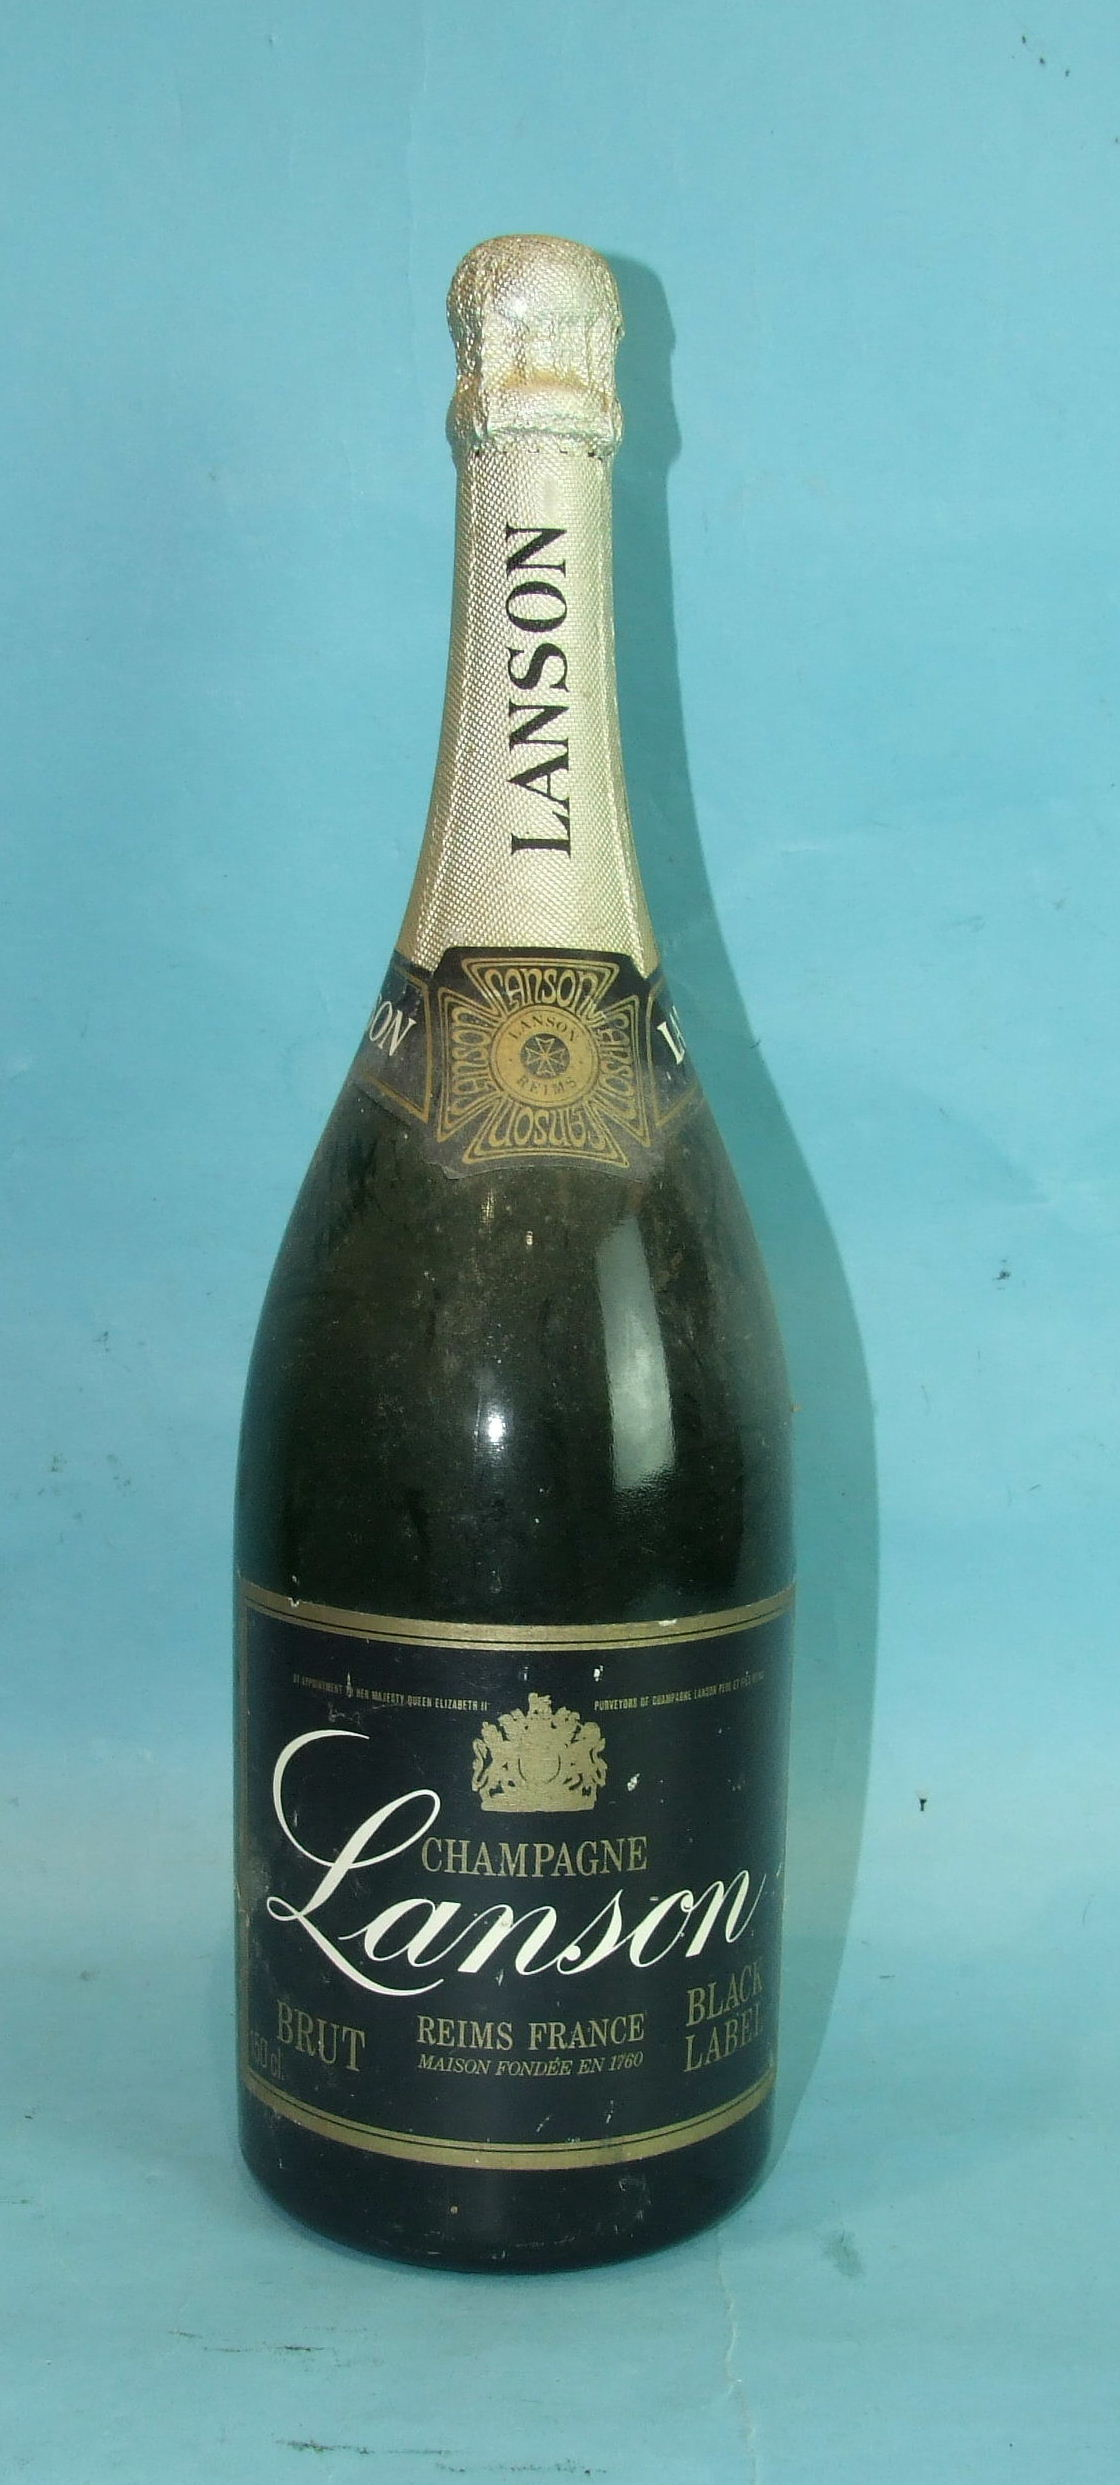 Lot 2 - Lanson Black Label Brut Champagne, one magnum.